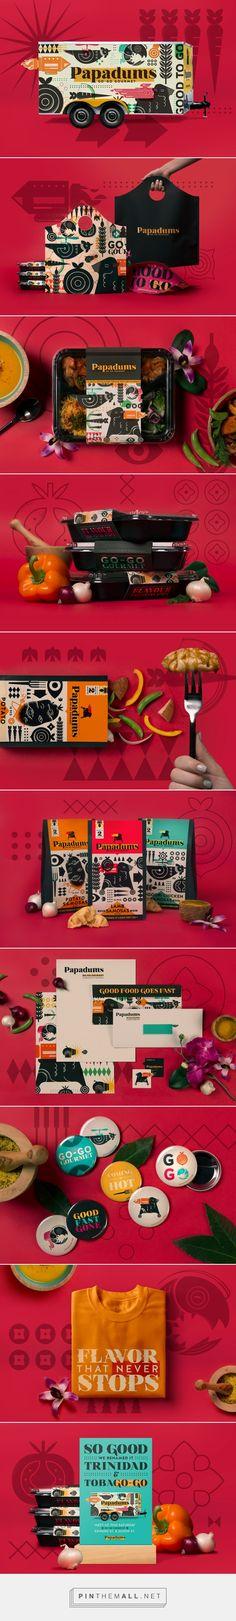 Papadums Go-Go Gourmet packaging design by Whiskey Design - https://www.packagingoftheworld.com/2018/03/papadums-go-go-gourmet.html